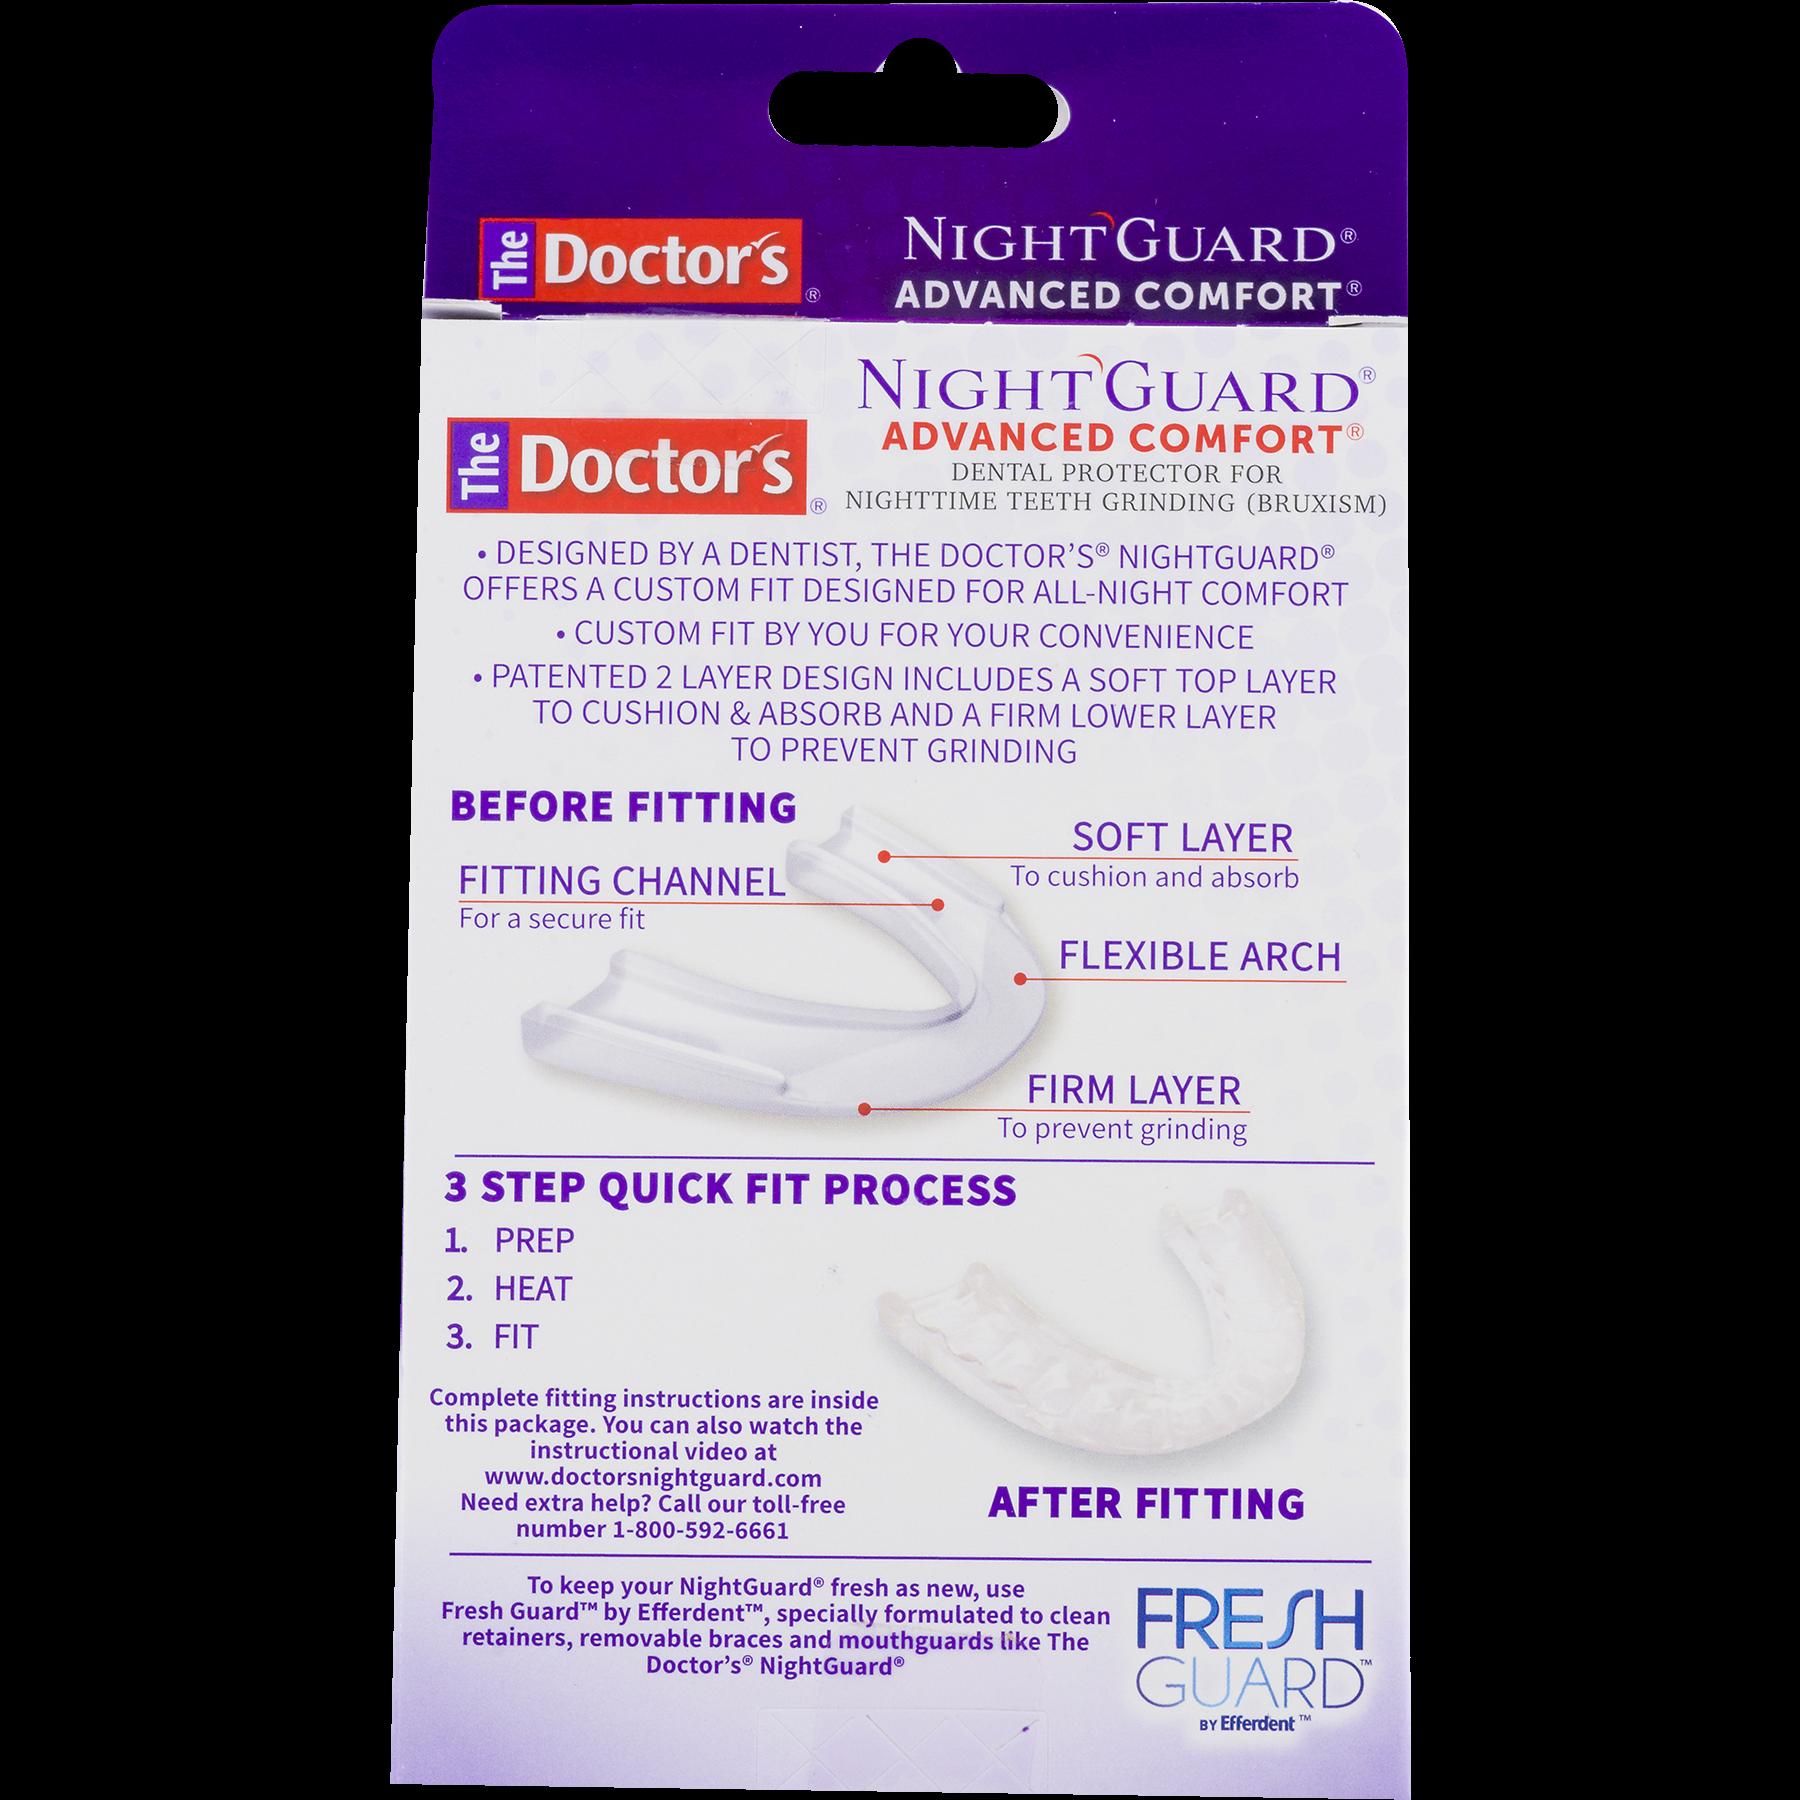 protector dental advanced the night comfort product walmart ct comforter reviews com guard doctor s